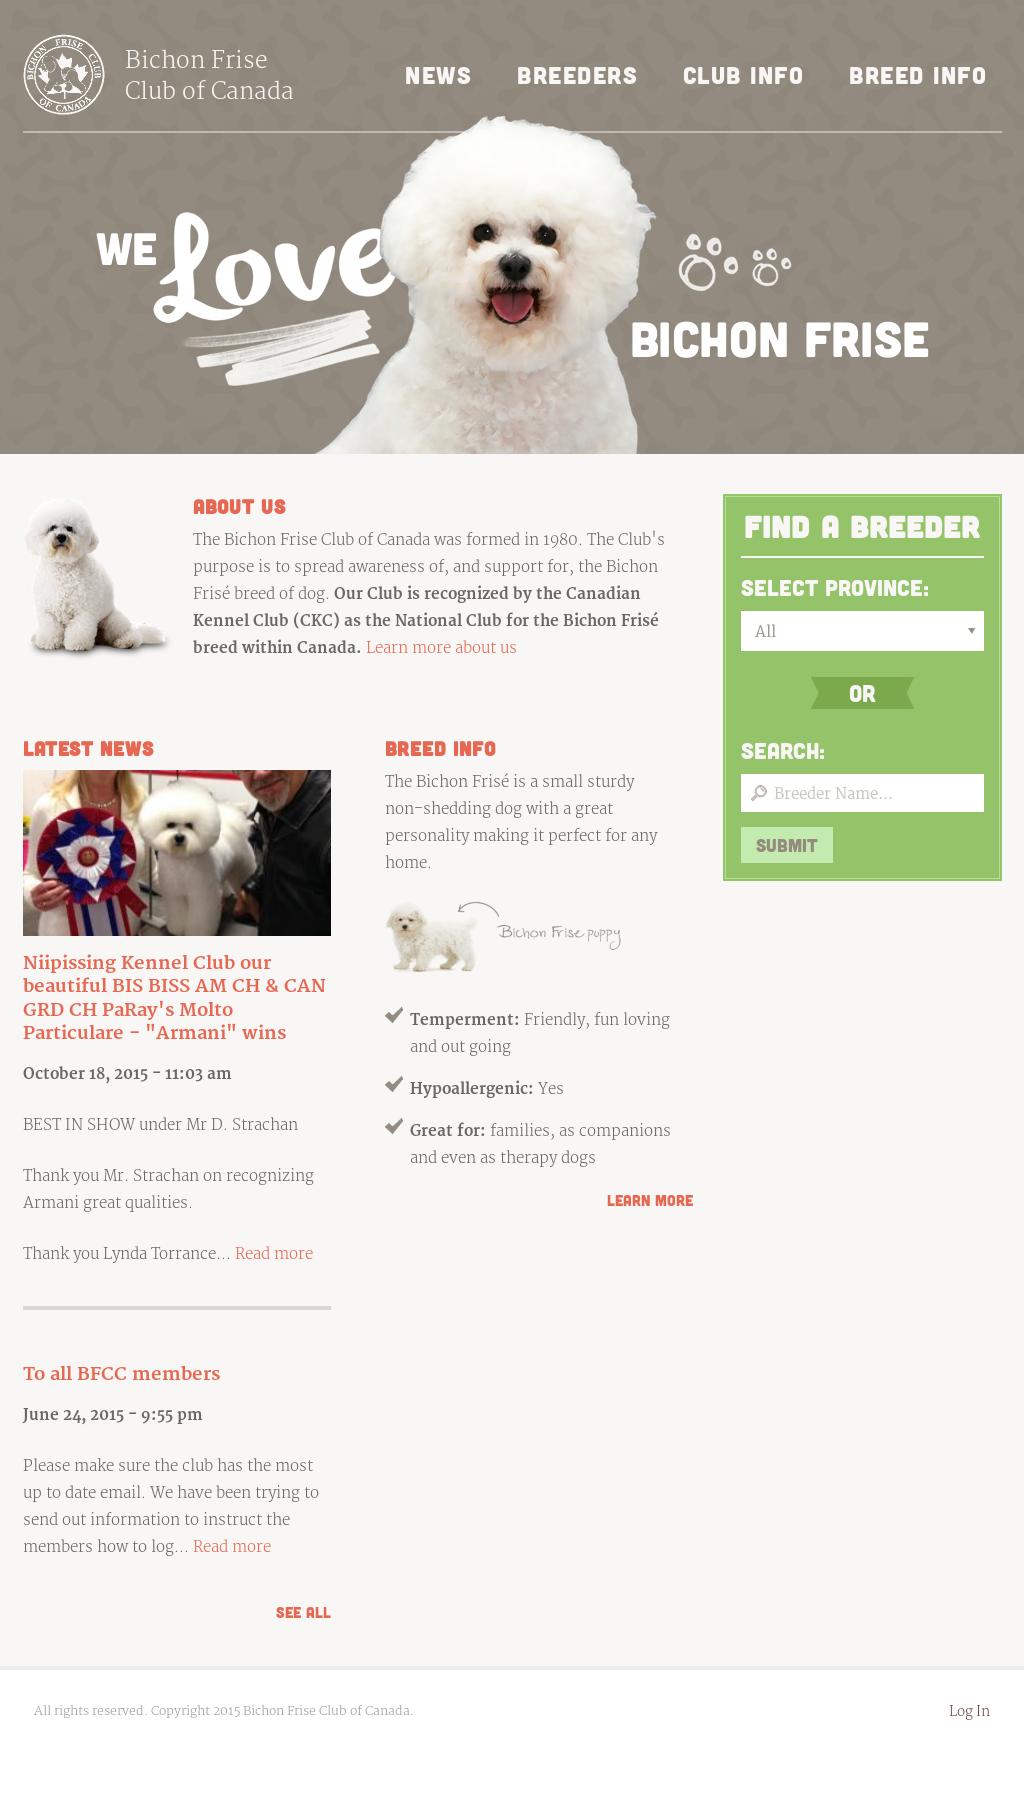 Bichon Frise Club Of Canada Competitors, Revenue and